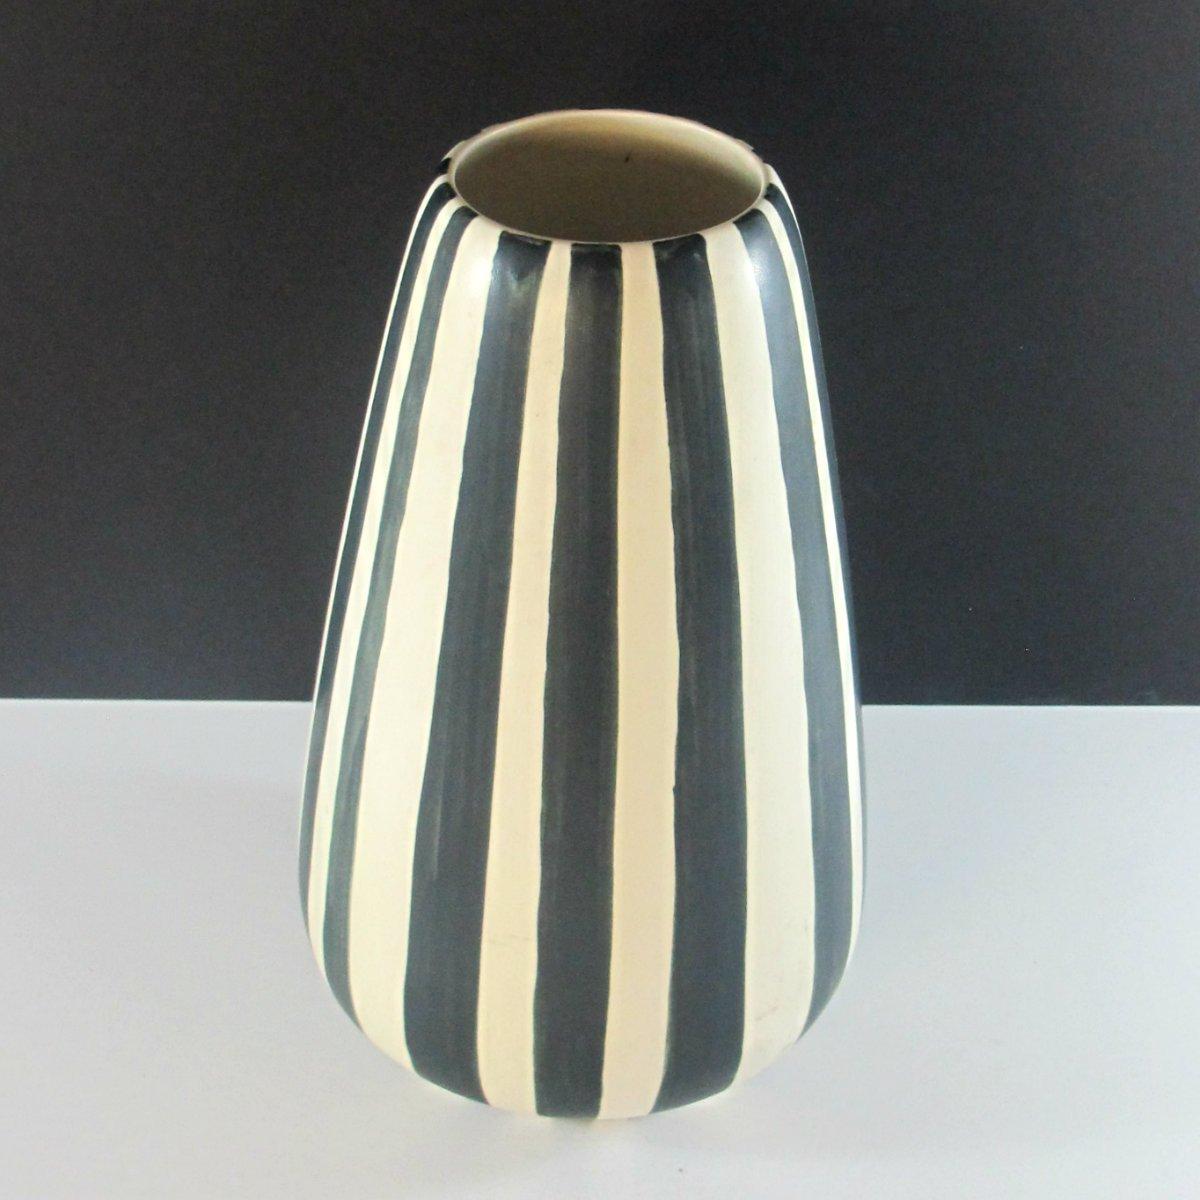 Vase by maria kohler for villeroy et boch 1960s for sale at pamono vase by maria kohler for villeroy et boch 1960s reviewsmspy